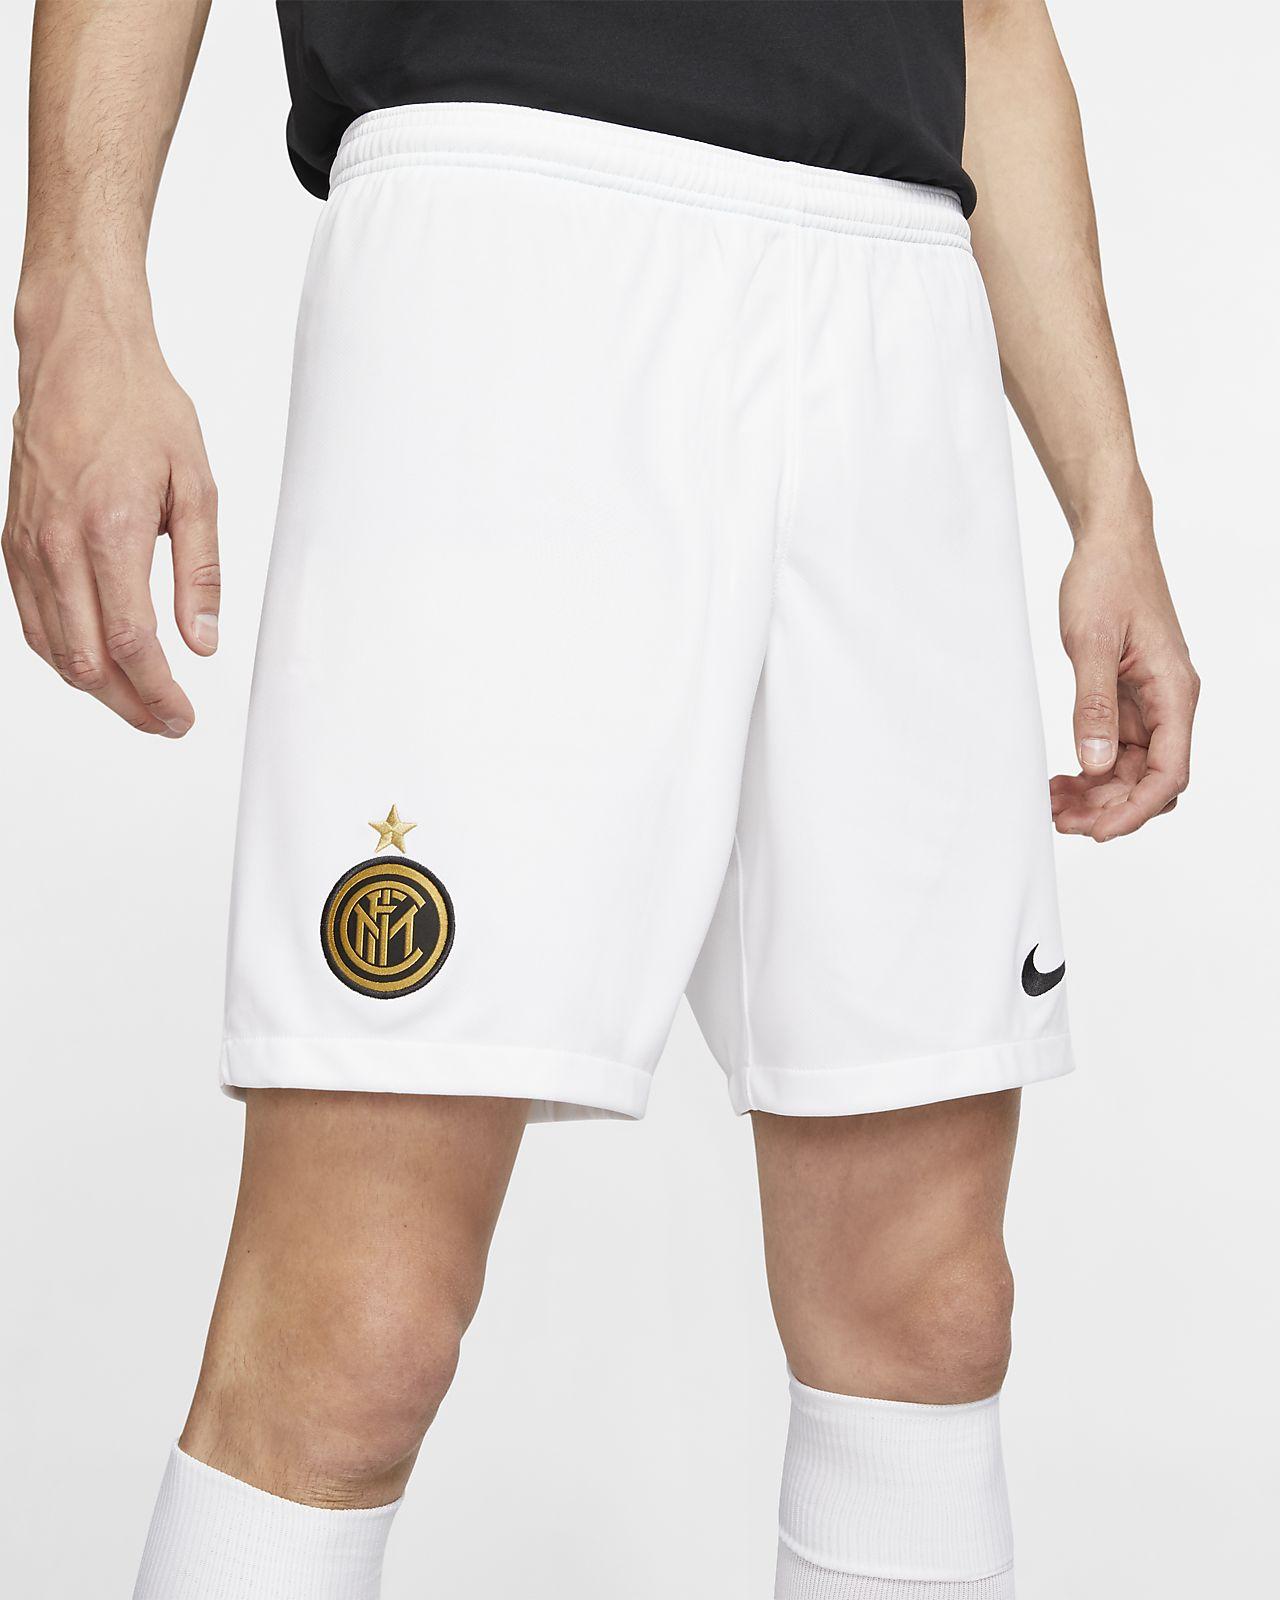 Shorts da calcio Inter 2019/20 Stadium Home/Away - Uomo